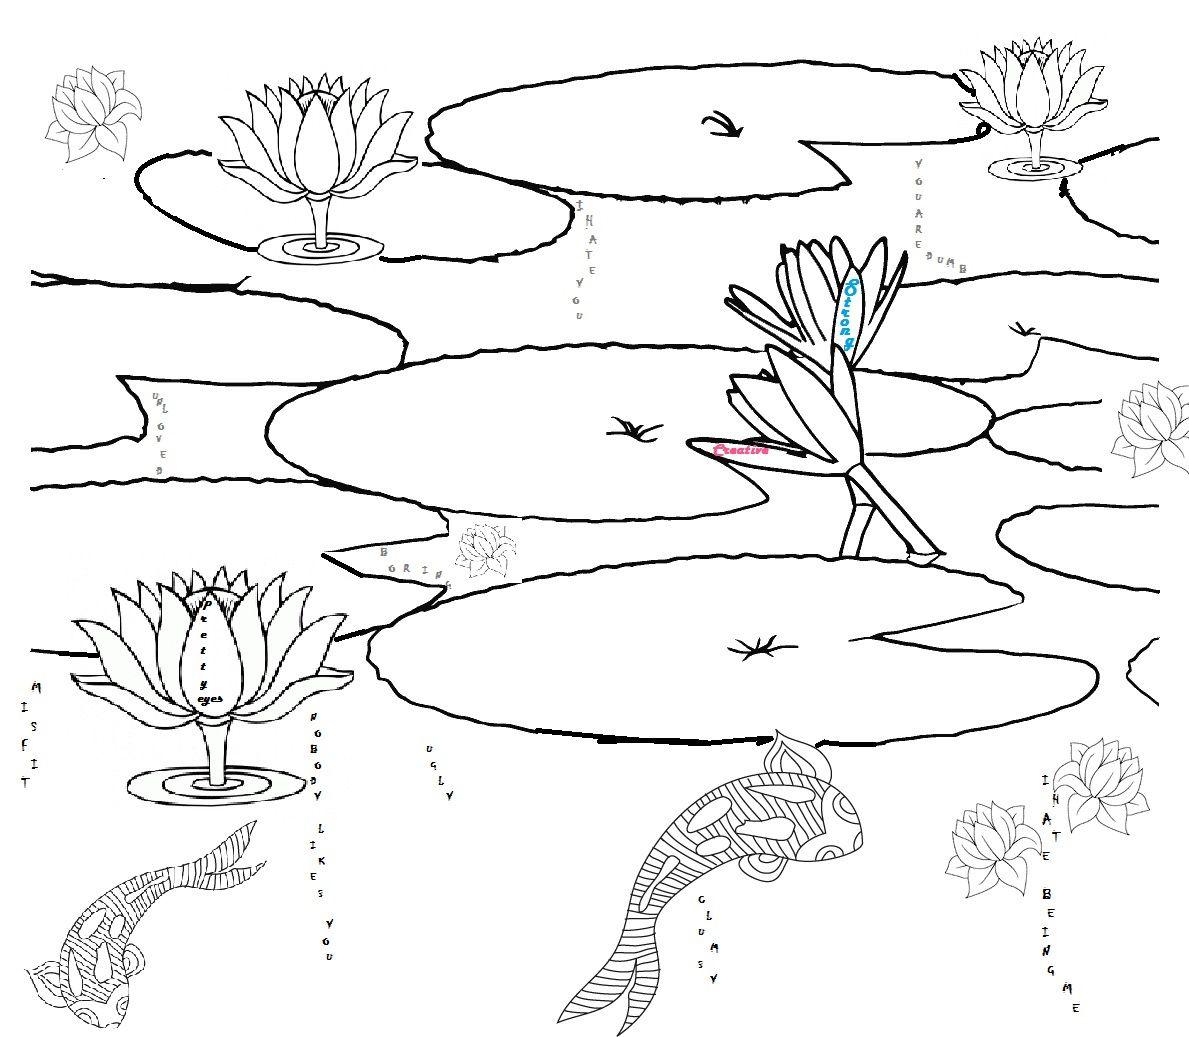 1189x1037 Printable Pond Habitat Coloring Page Ponds Pond